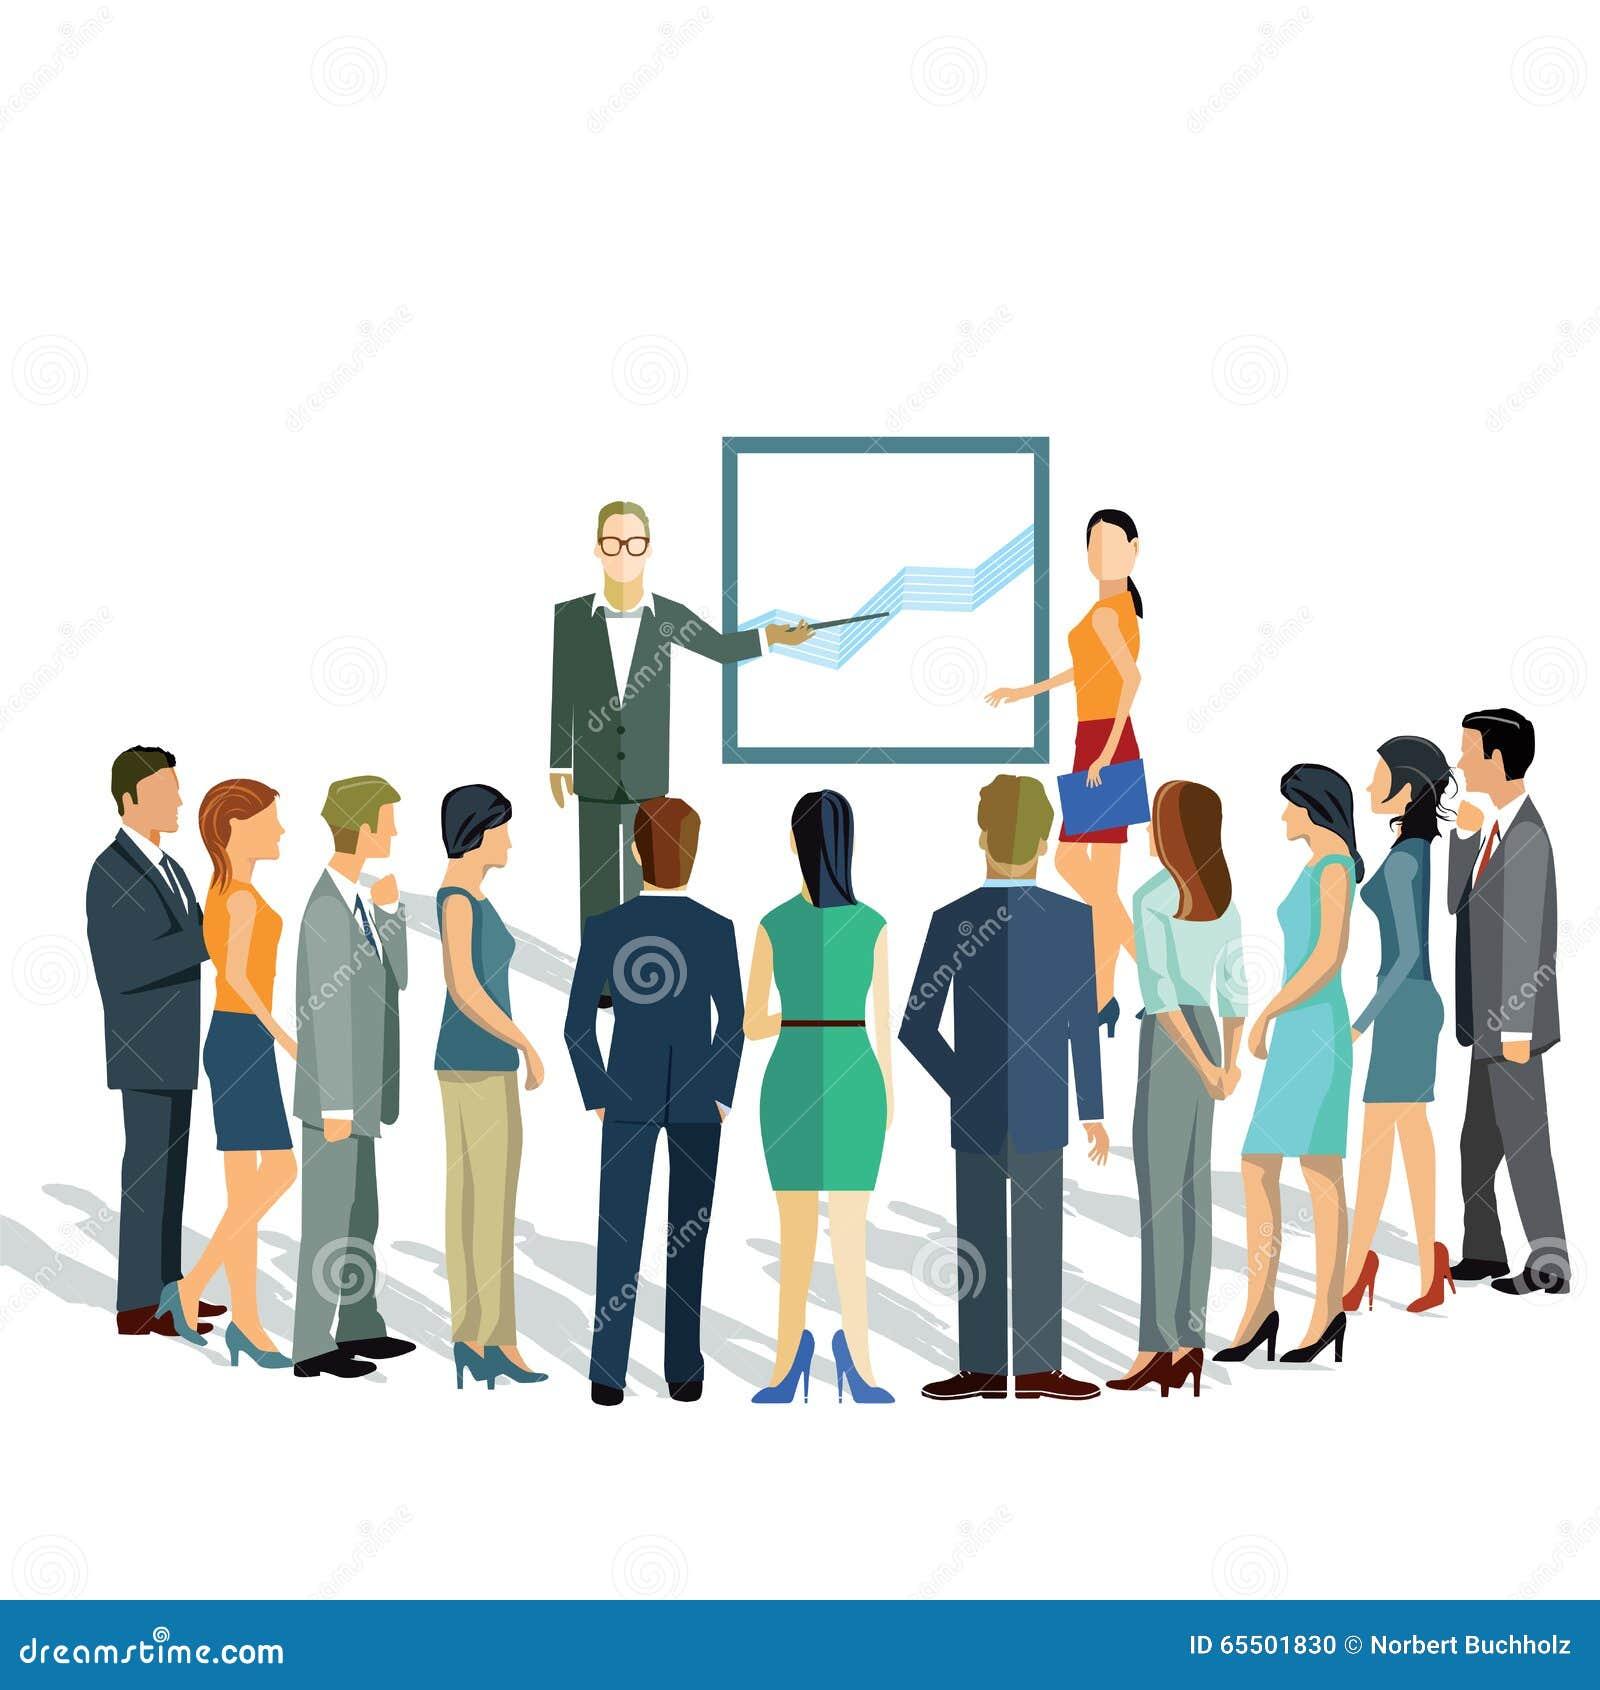 7 brilliant ways successful leaders start presentations